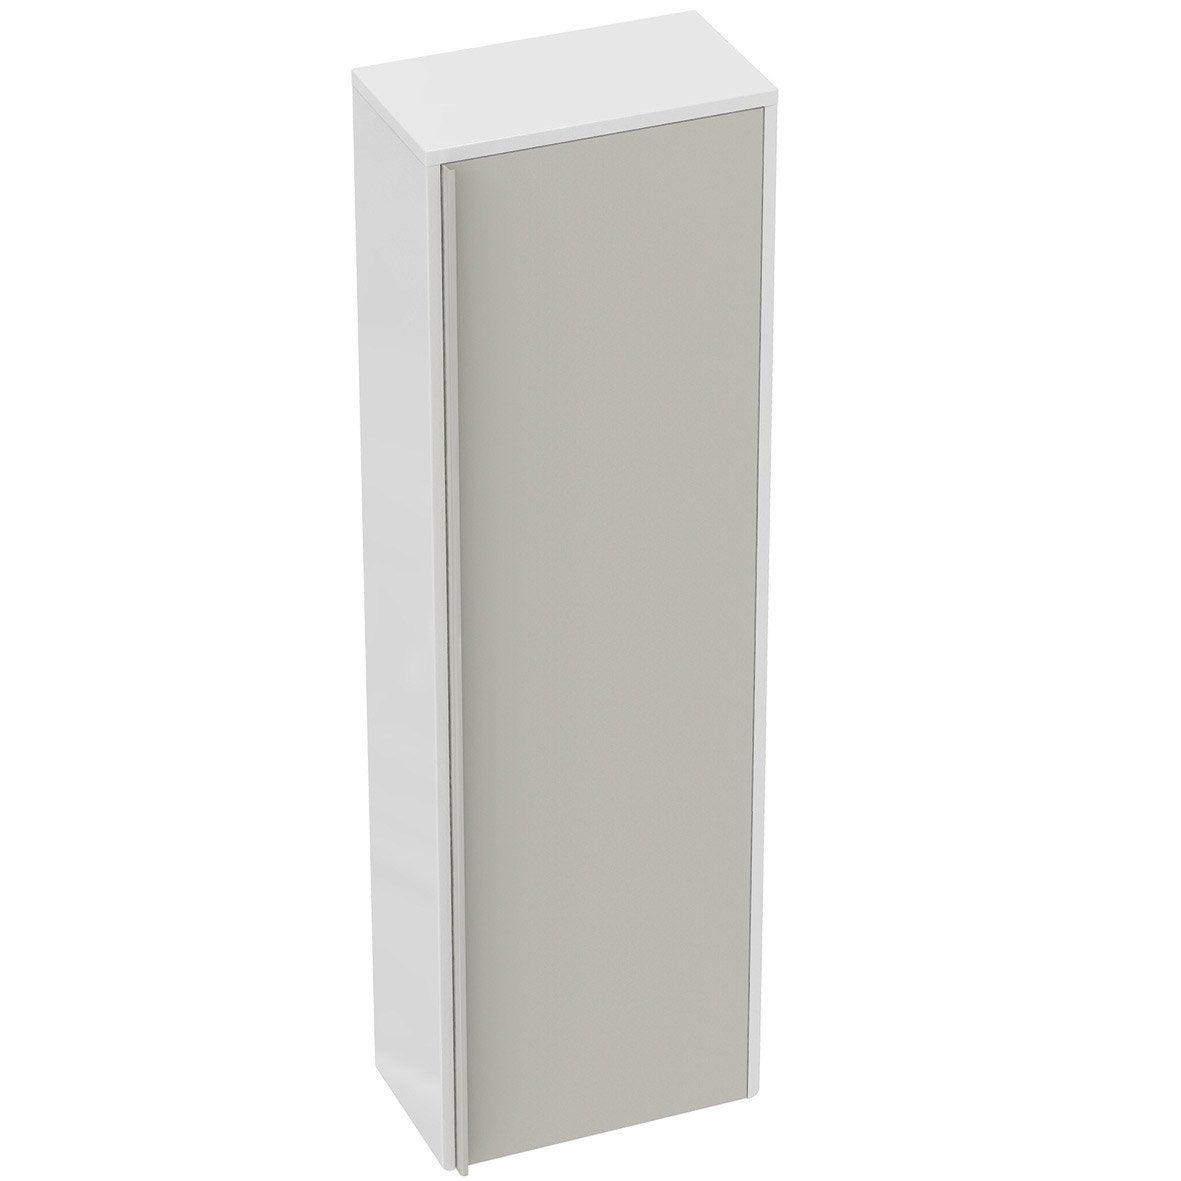 Meuble demi colonne ideal standard idealsmart marron for Leroy merlin colonne